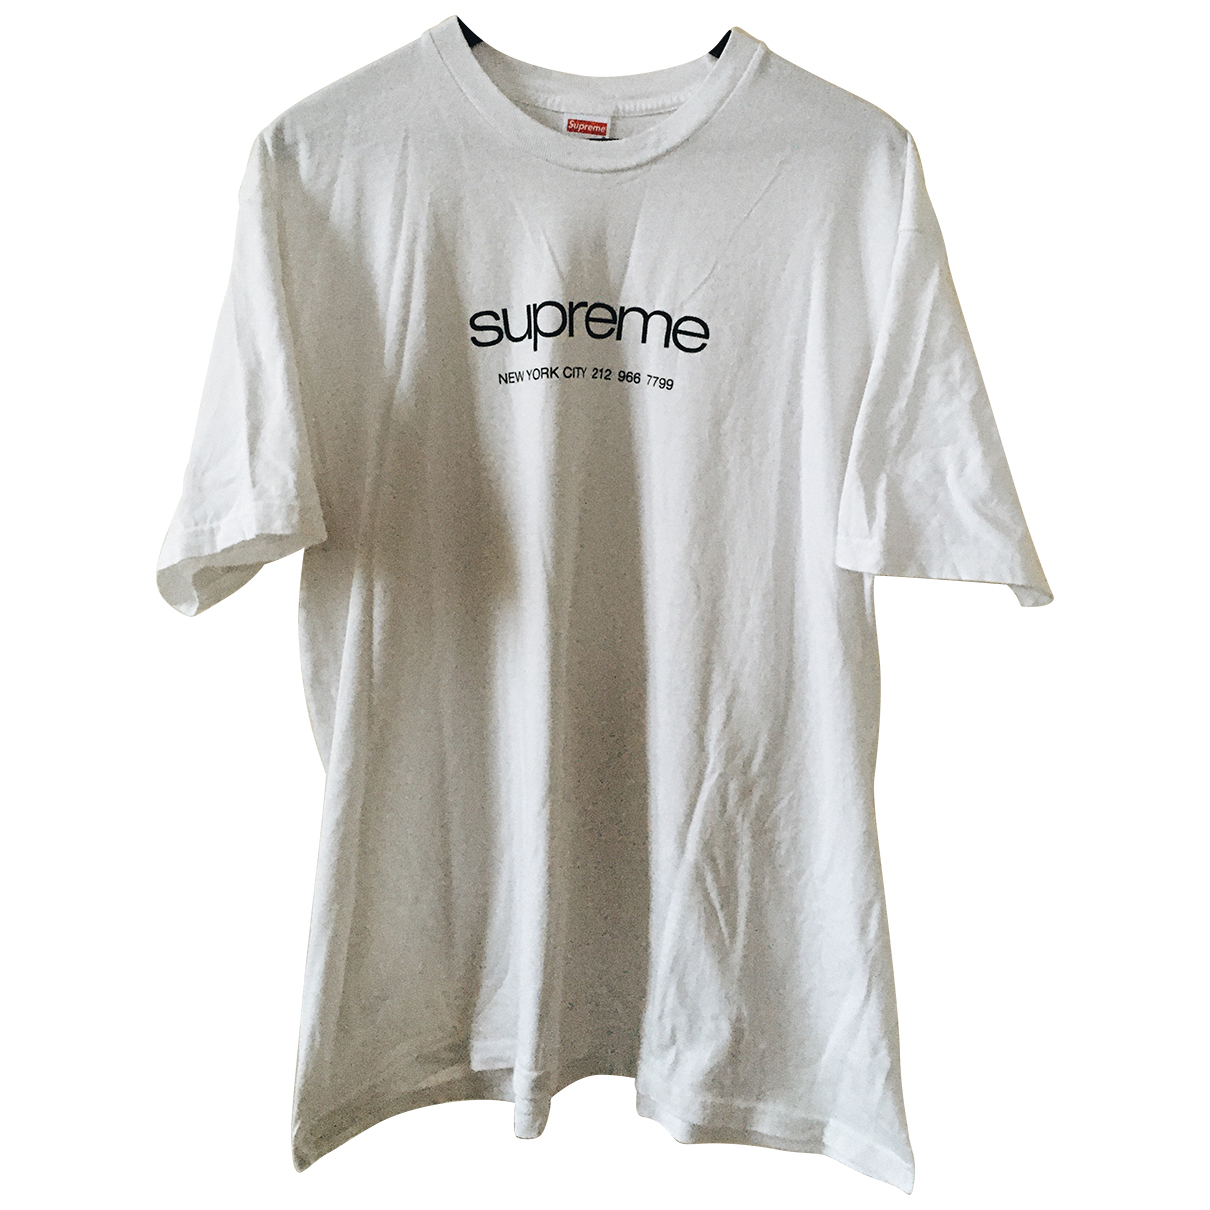 Supreme - Tee shirts   pour homme en coton - blanc